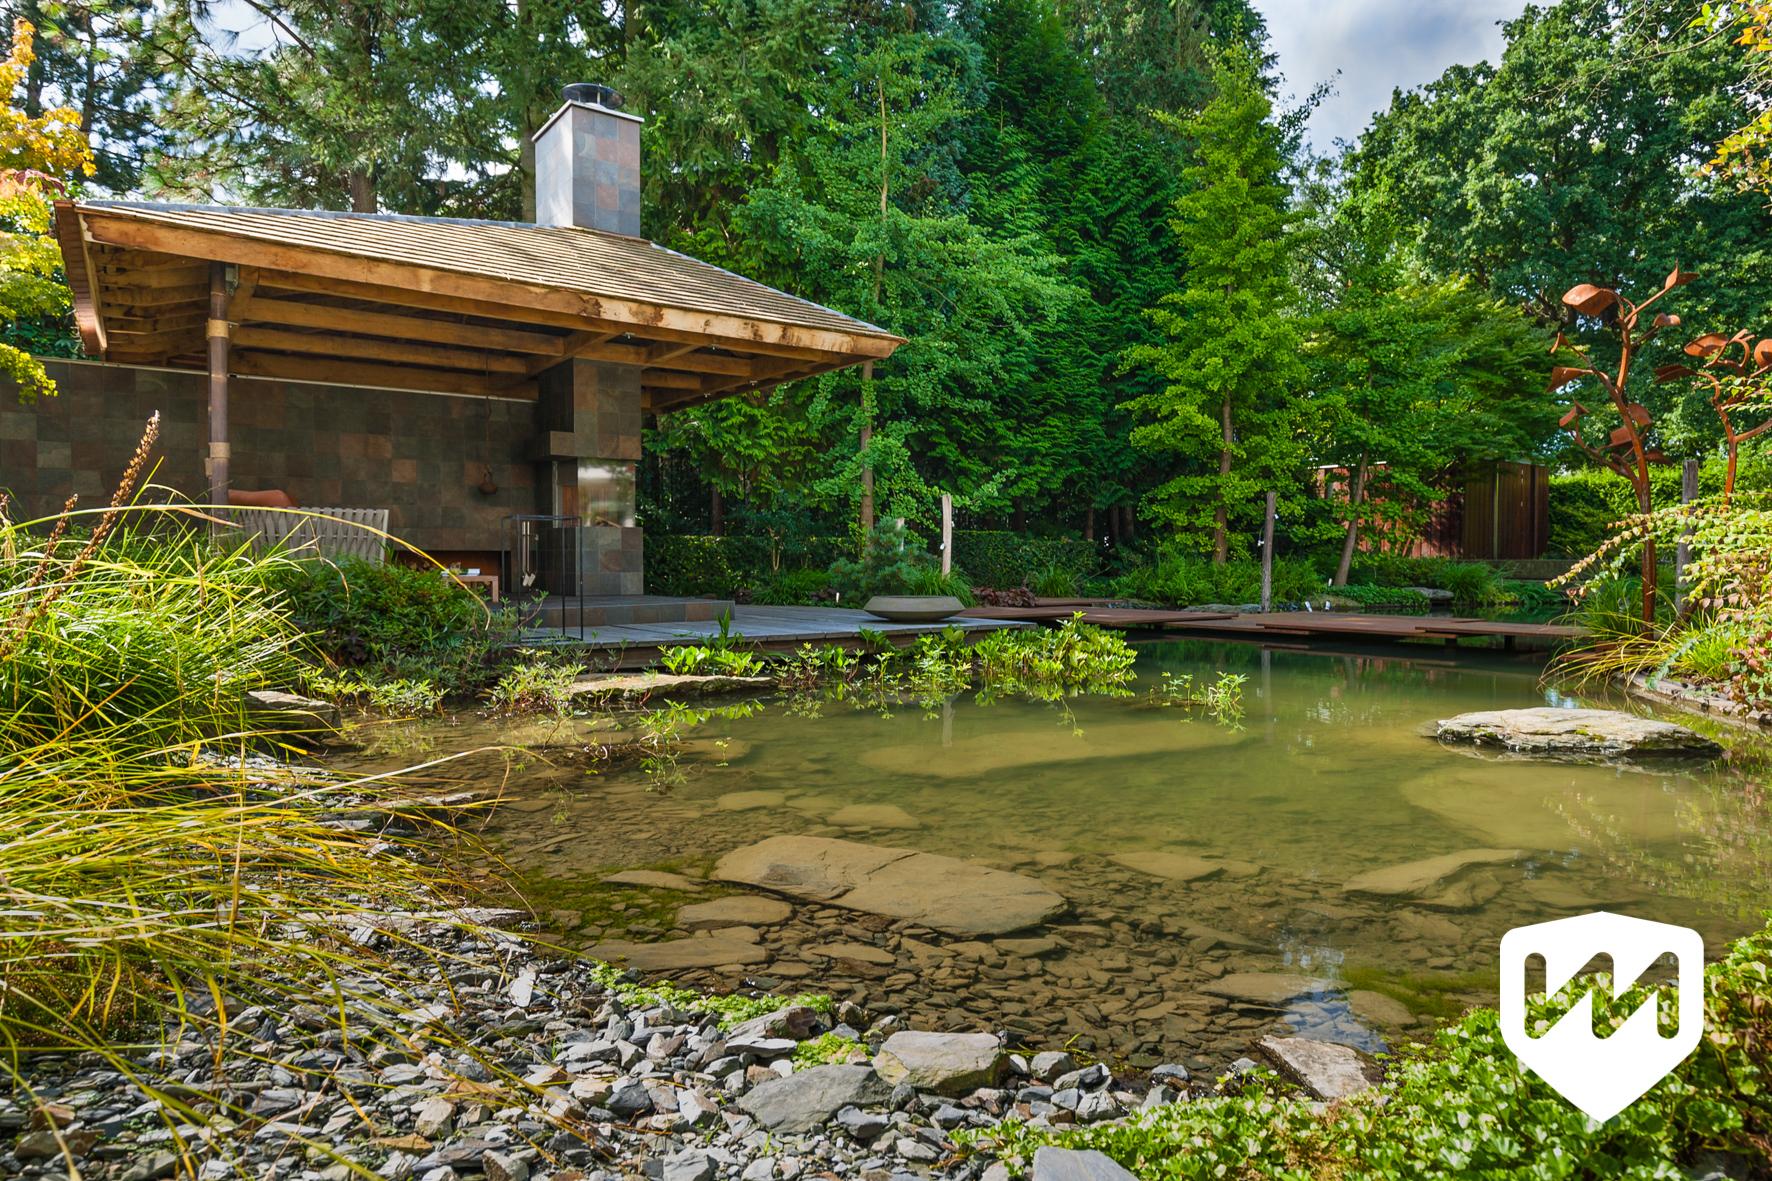 De japanse watertuin winnaar sgd awards 2019 van mierlo tuinen